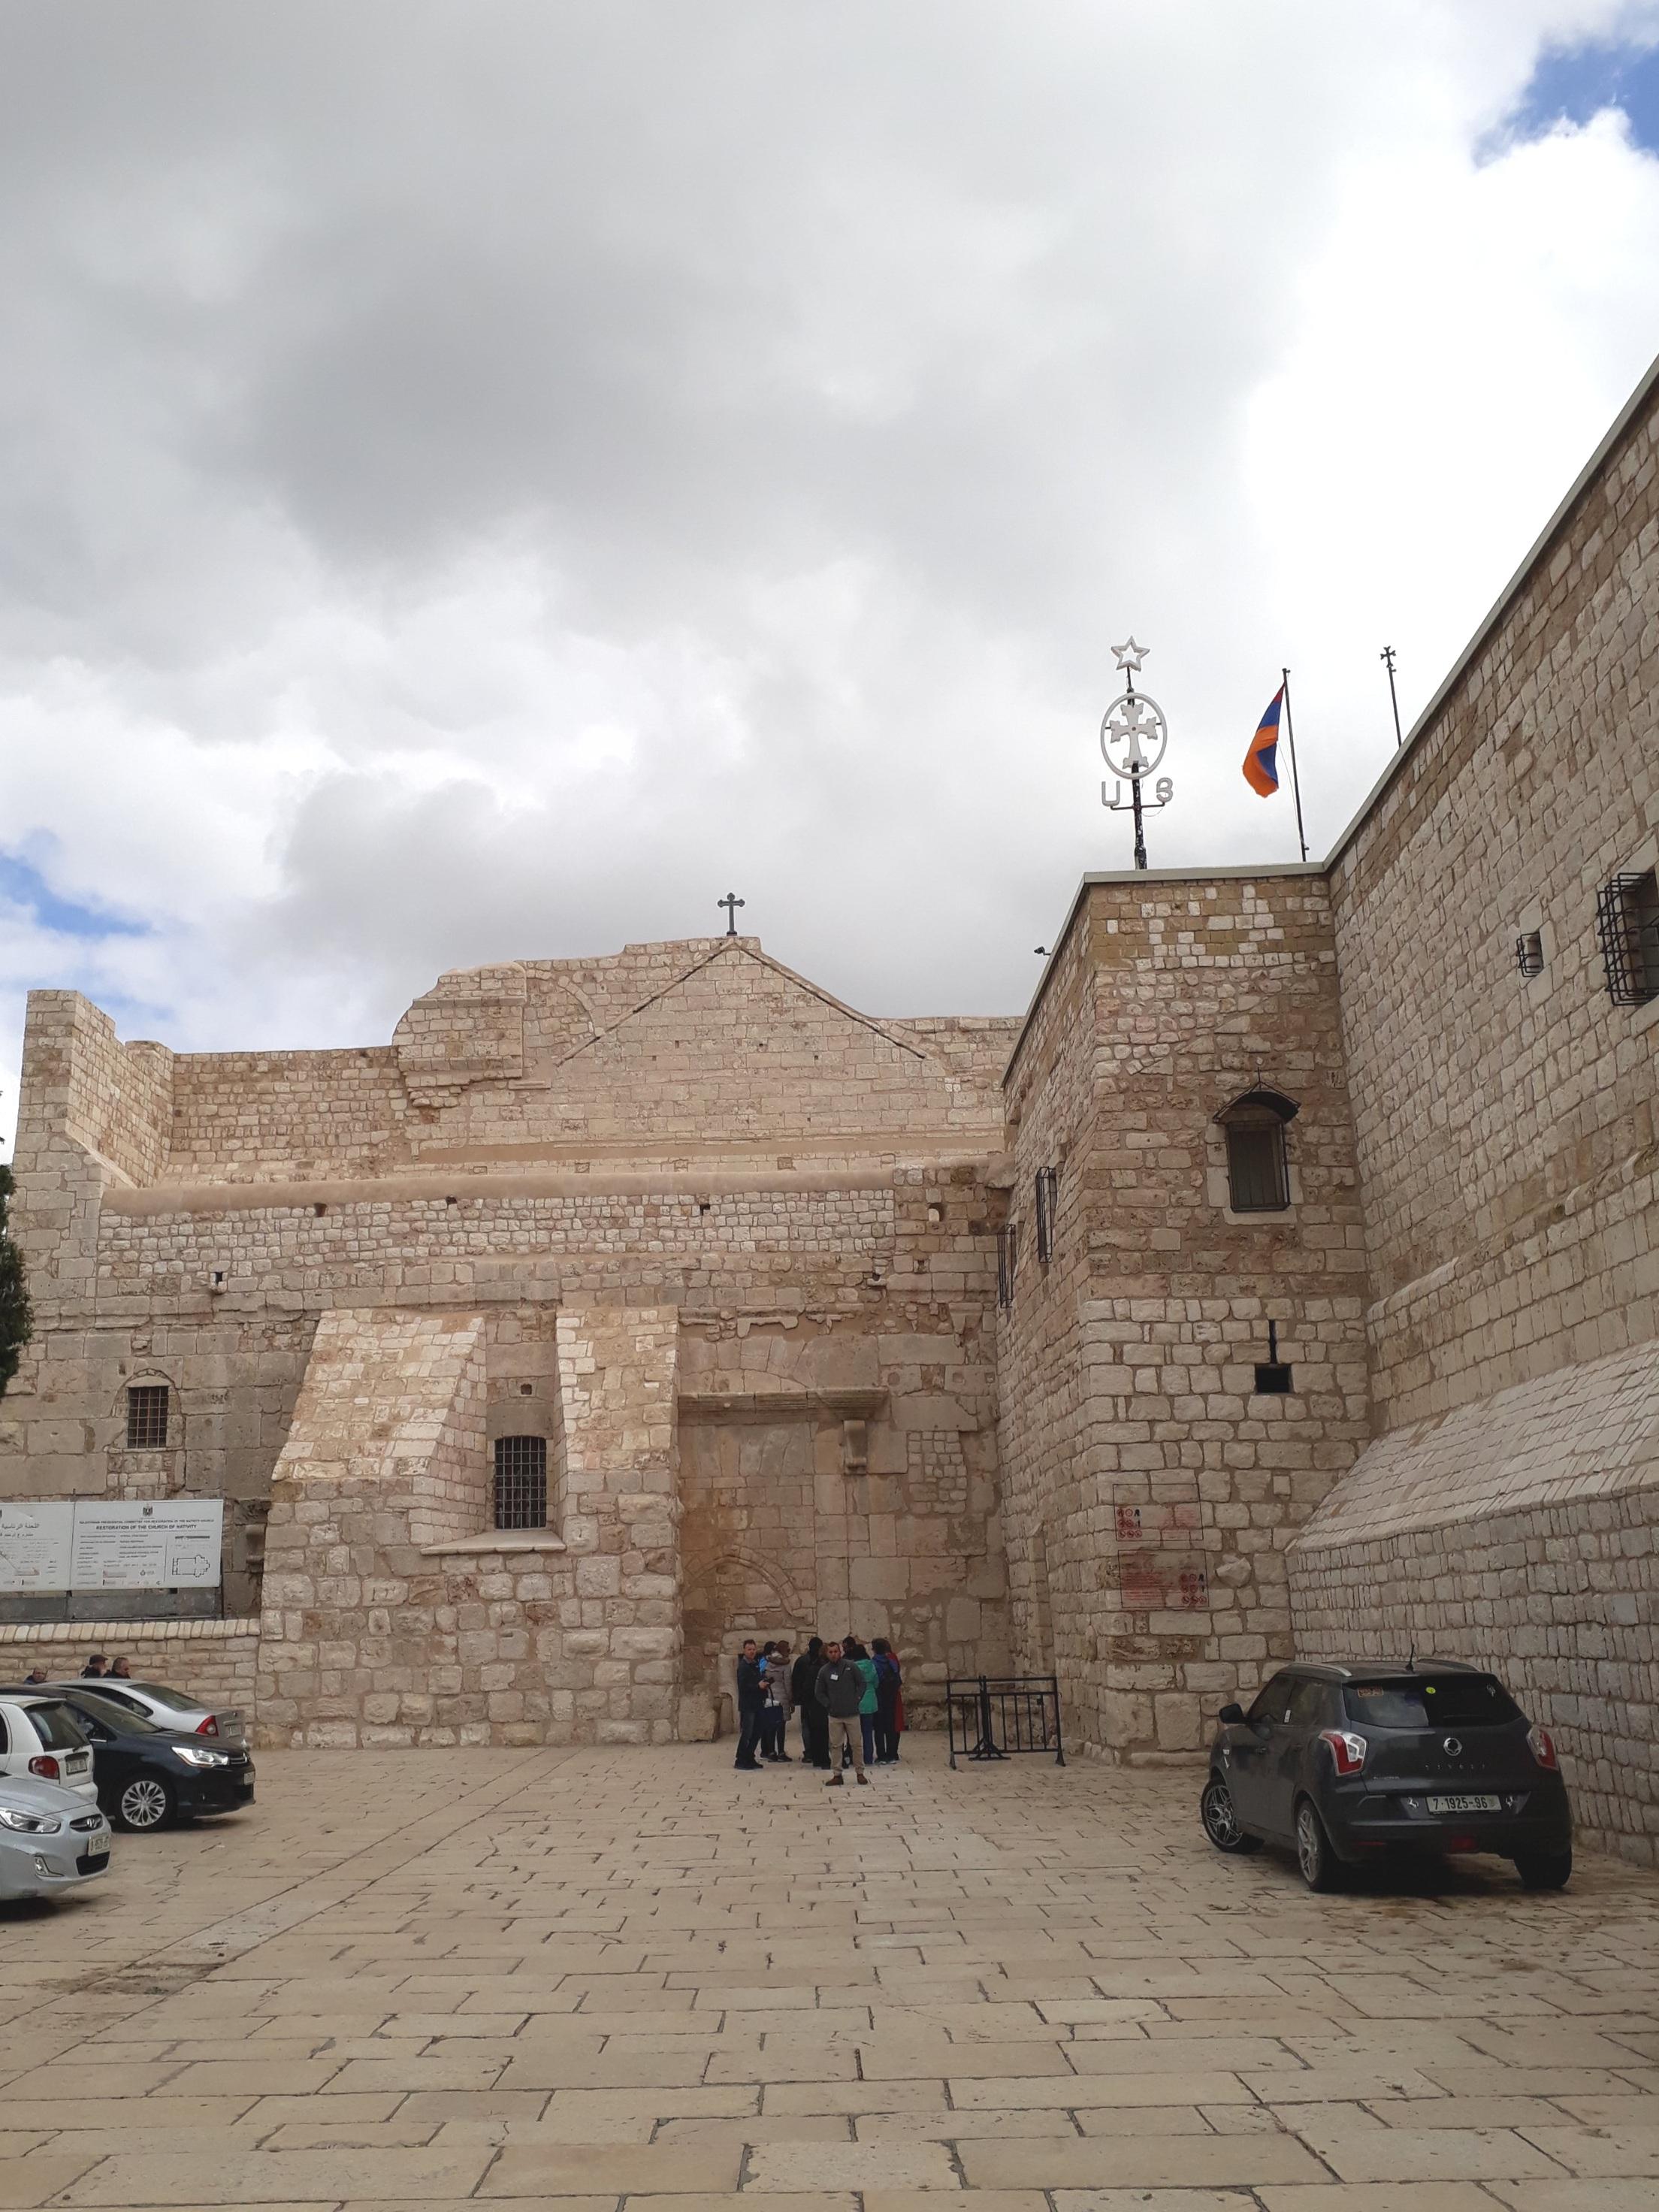 Entrance to the church of the nativity bethlehem palestine